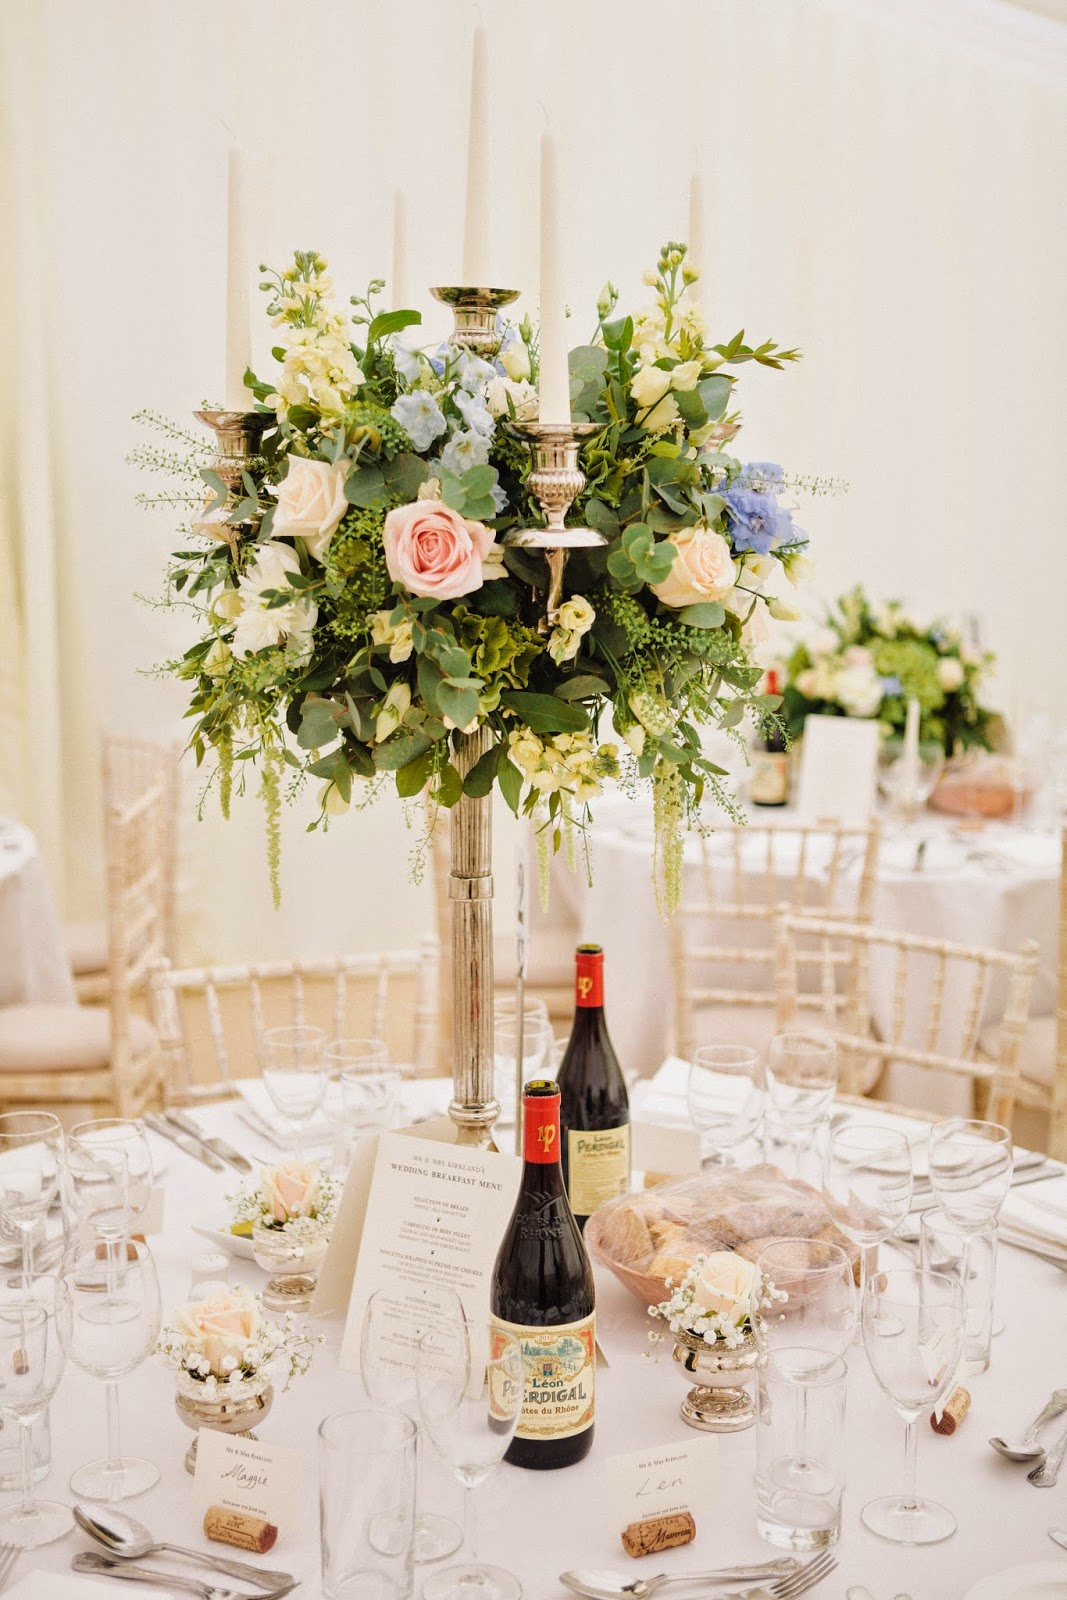 Reception Candelabra Flowers, Joanna Carter Wedding Flowers, Oxford, Oxfordshire, Buckinghamshire, Berkshire and London